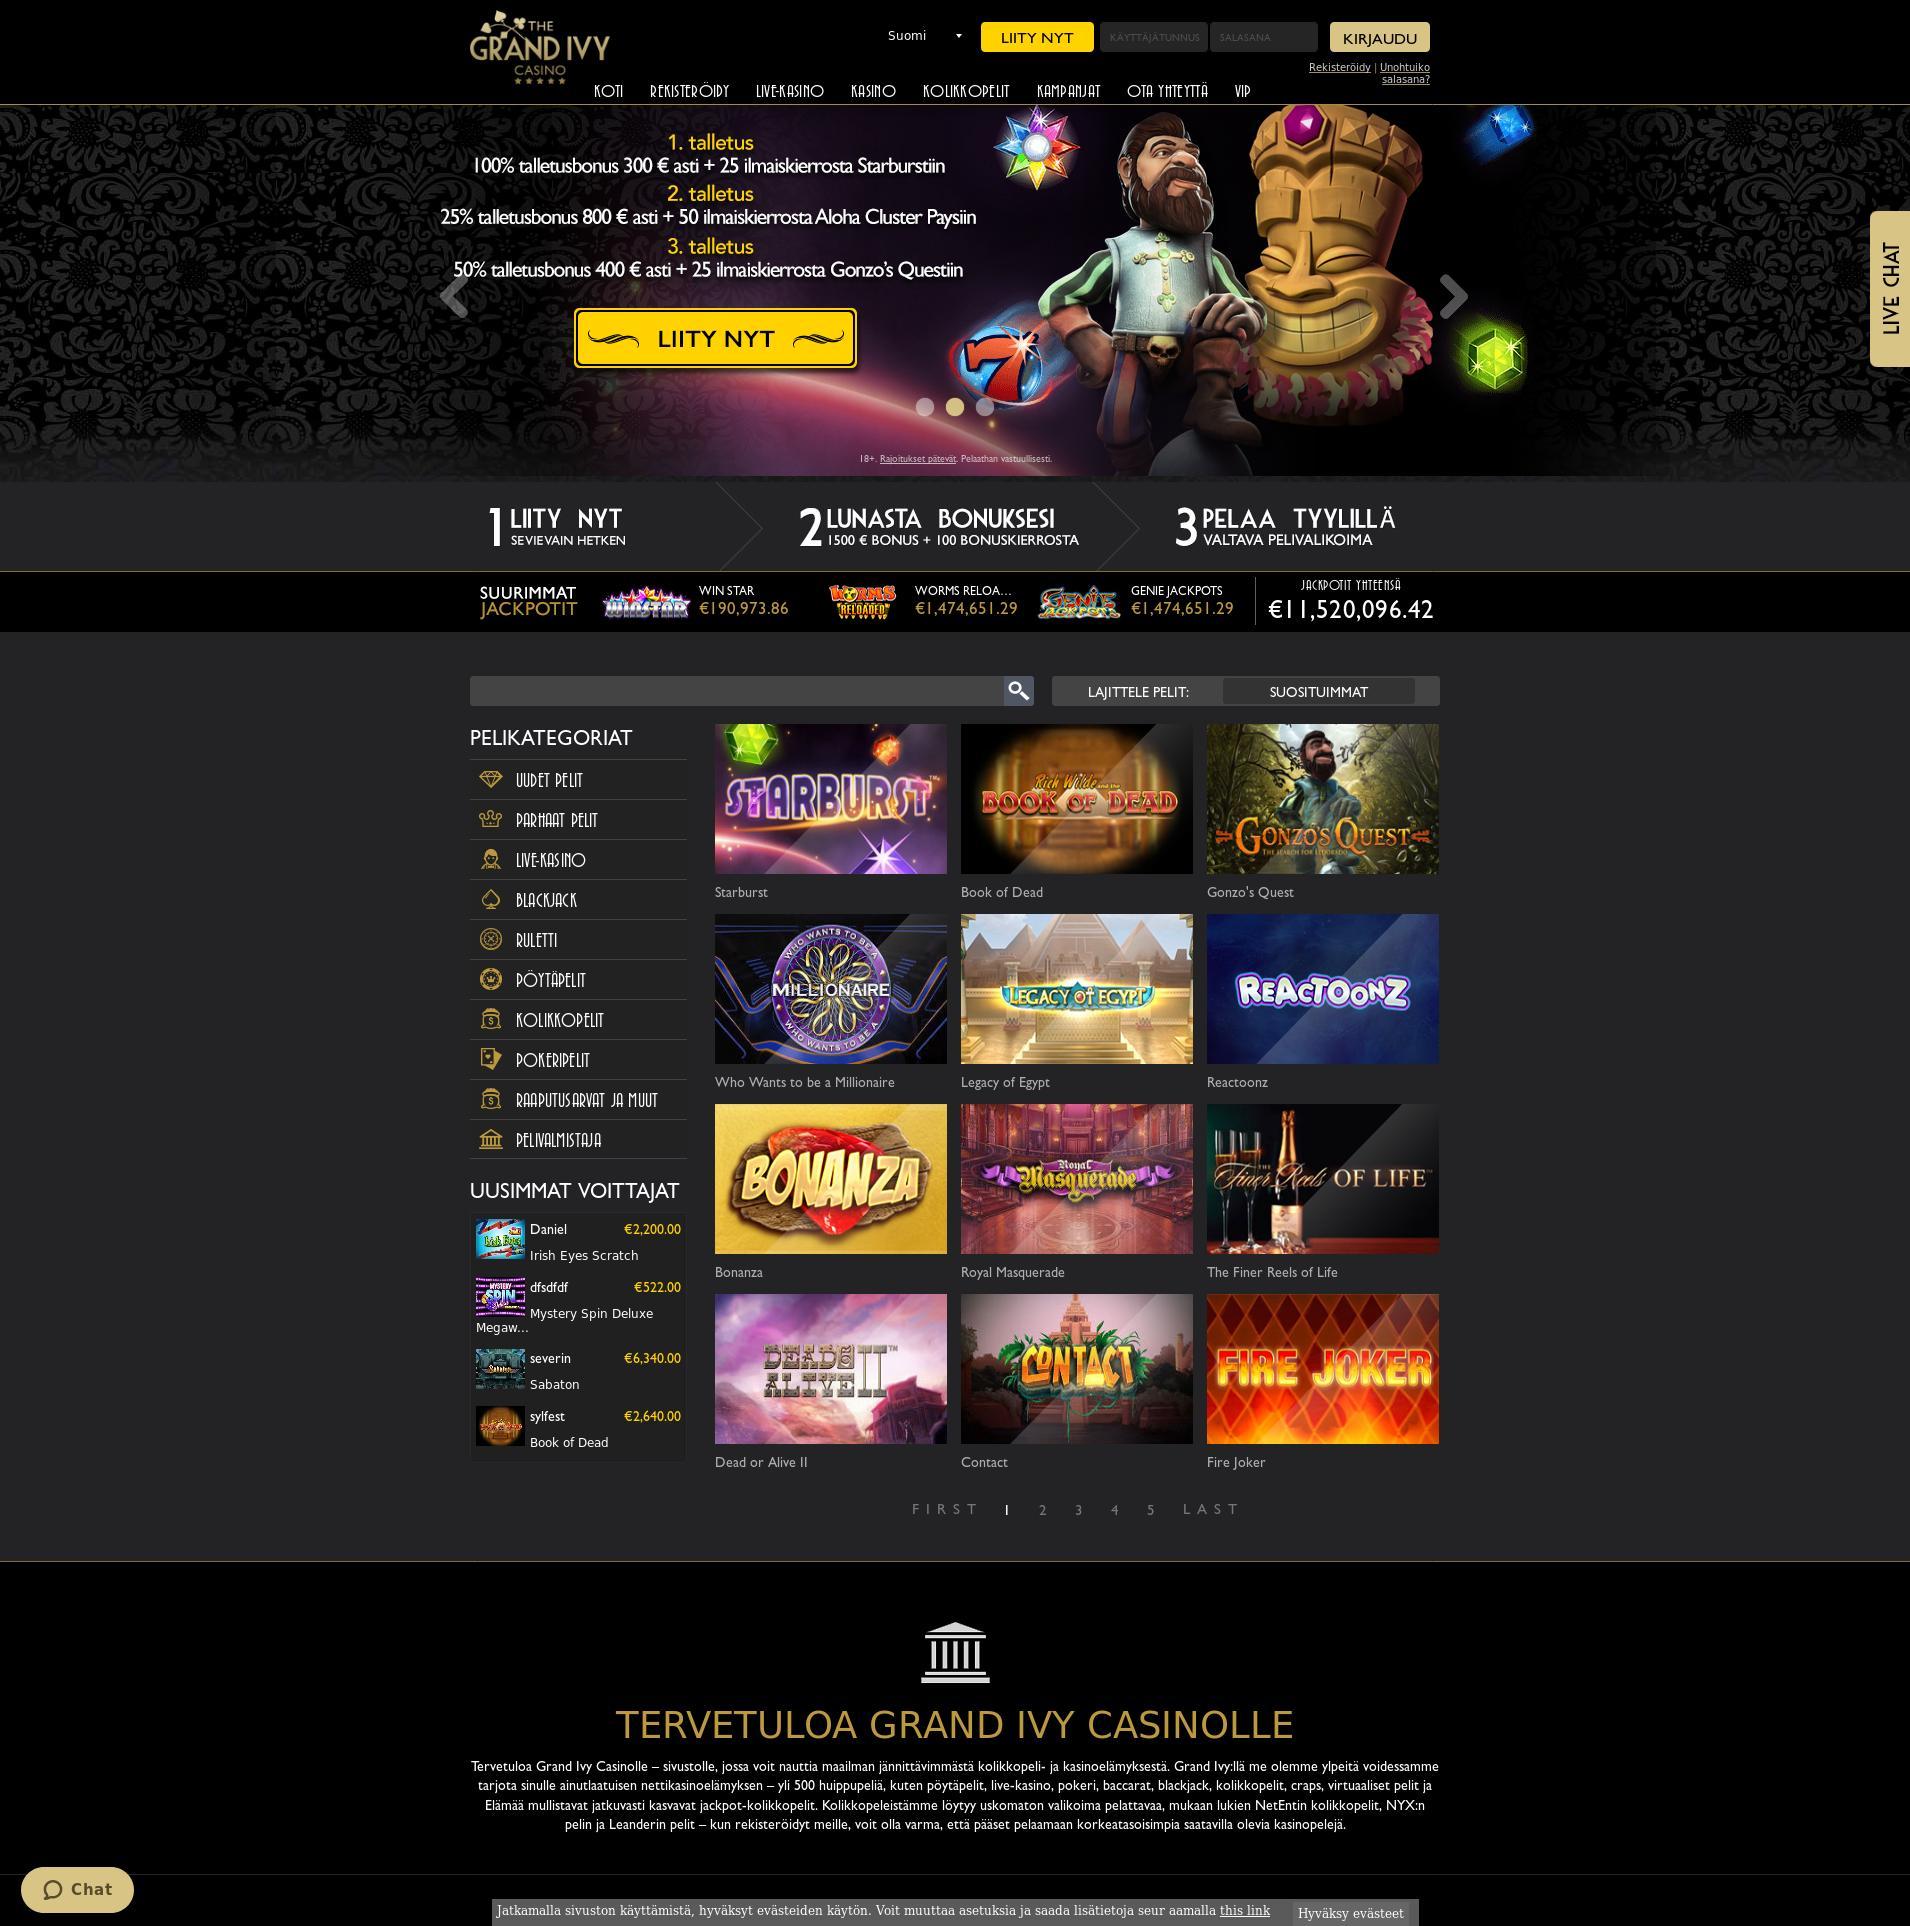 Casino screen Lobby 2019-07-15 for Finland